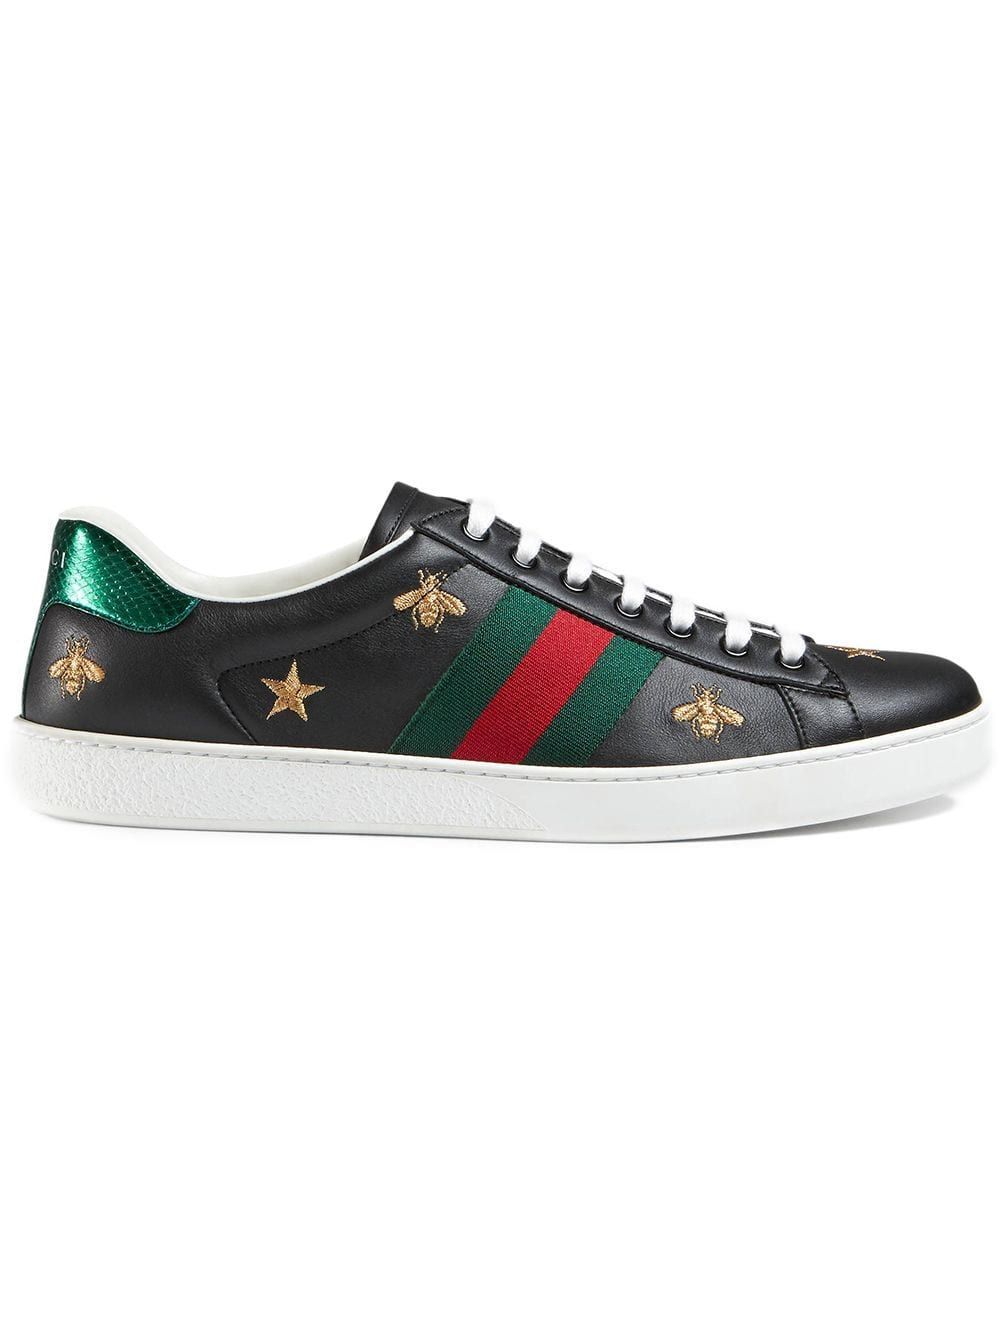 190fe52198579 GUCCI GUCCI ACE EMBROIDERED SNEAKER - BLACK.  gucci  shoes